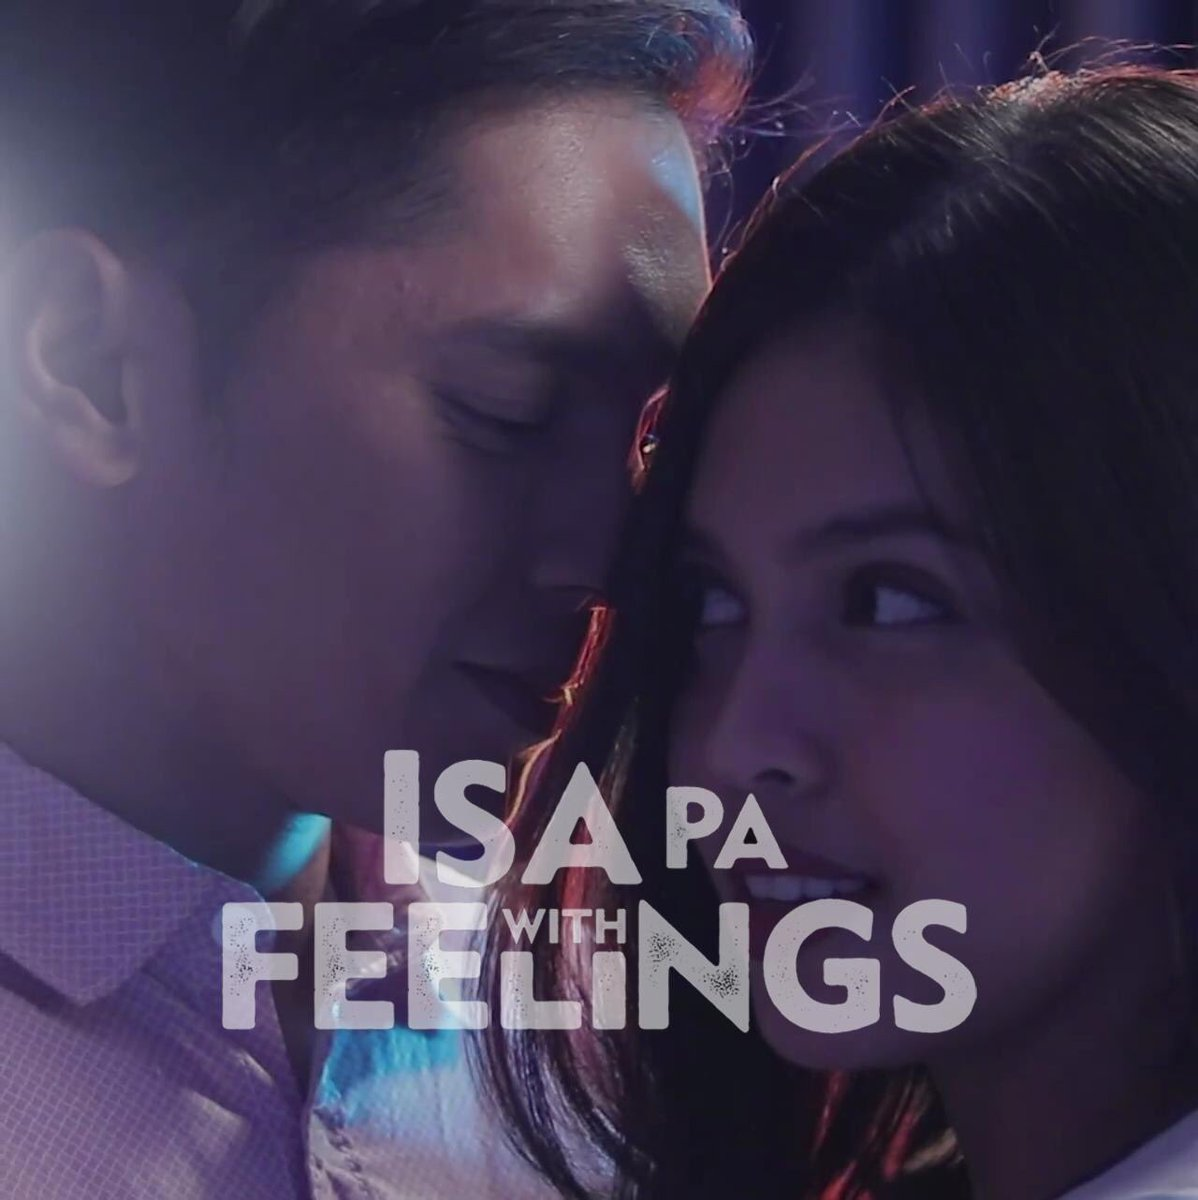 Carlo Aquino as Gali and Maine Mendoza as Mara in 'Isa Pa with Feelings'/Black Sheep